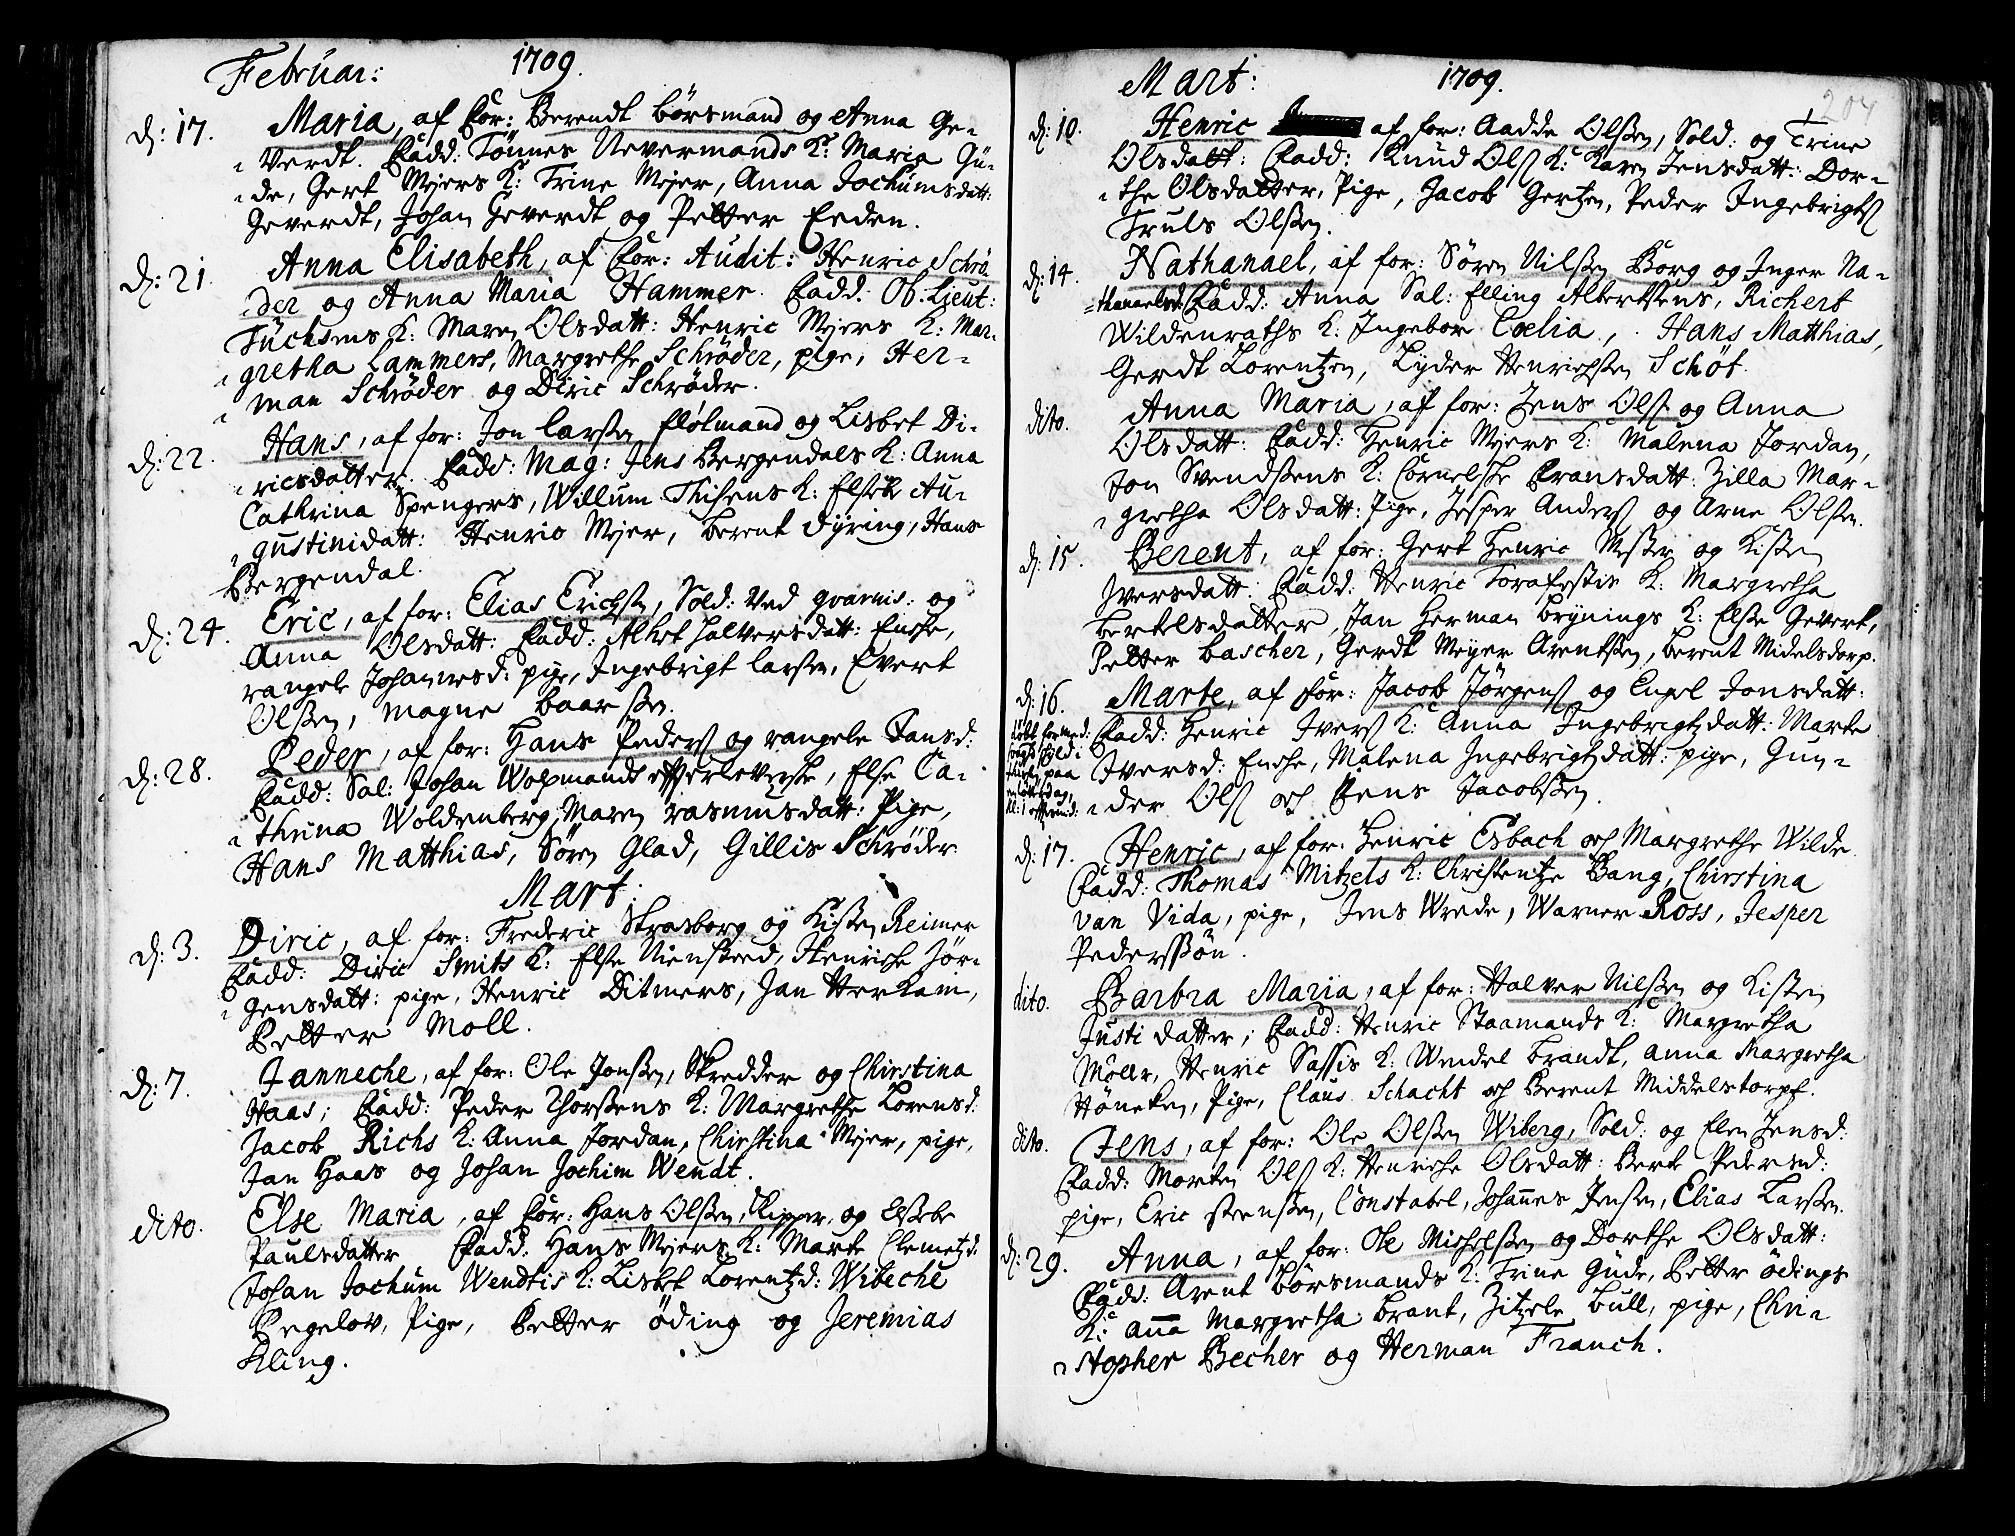 SAB, Korskirken Sokneprestembete, H/Haa/L0003: Ministerialbok nr. A 3, 1698-1719, s. 204